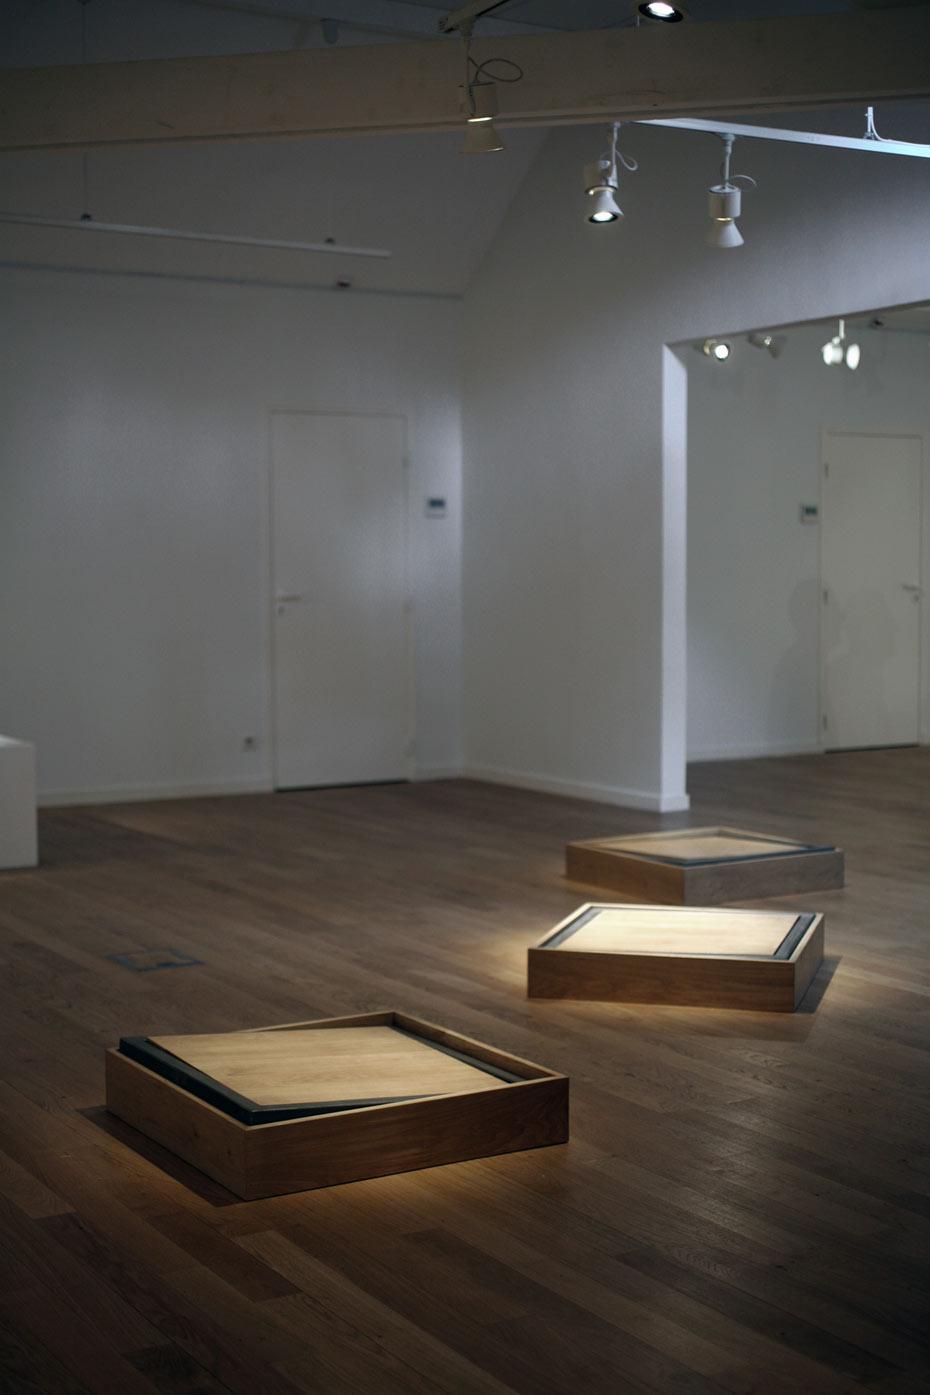 magma-Biennale Yerres-4-Charlotte Charbonnel